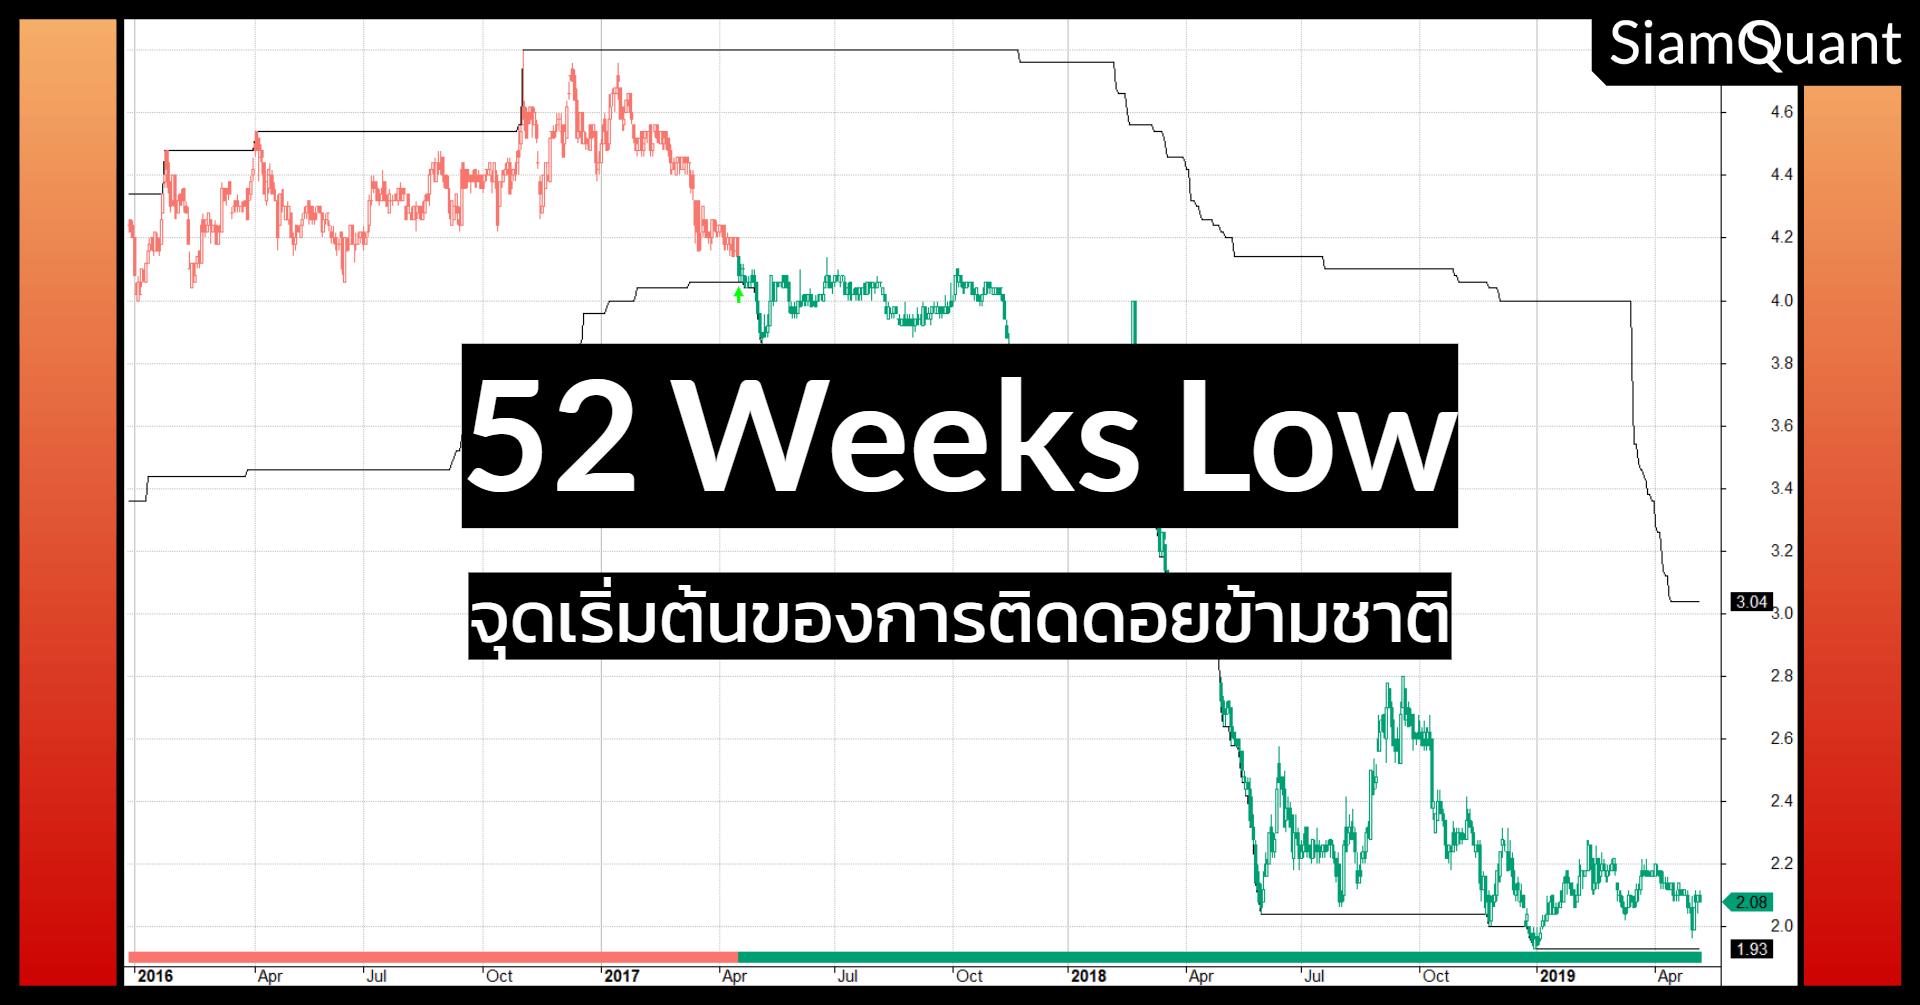 52 Weeks Low จุดเริ่มต้นของการติดดอยแบบข้ามชาติ! - SiamQuant